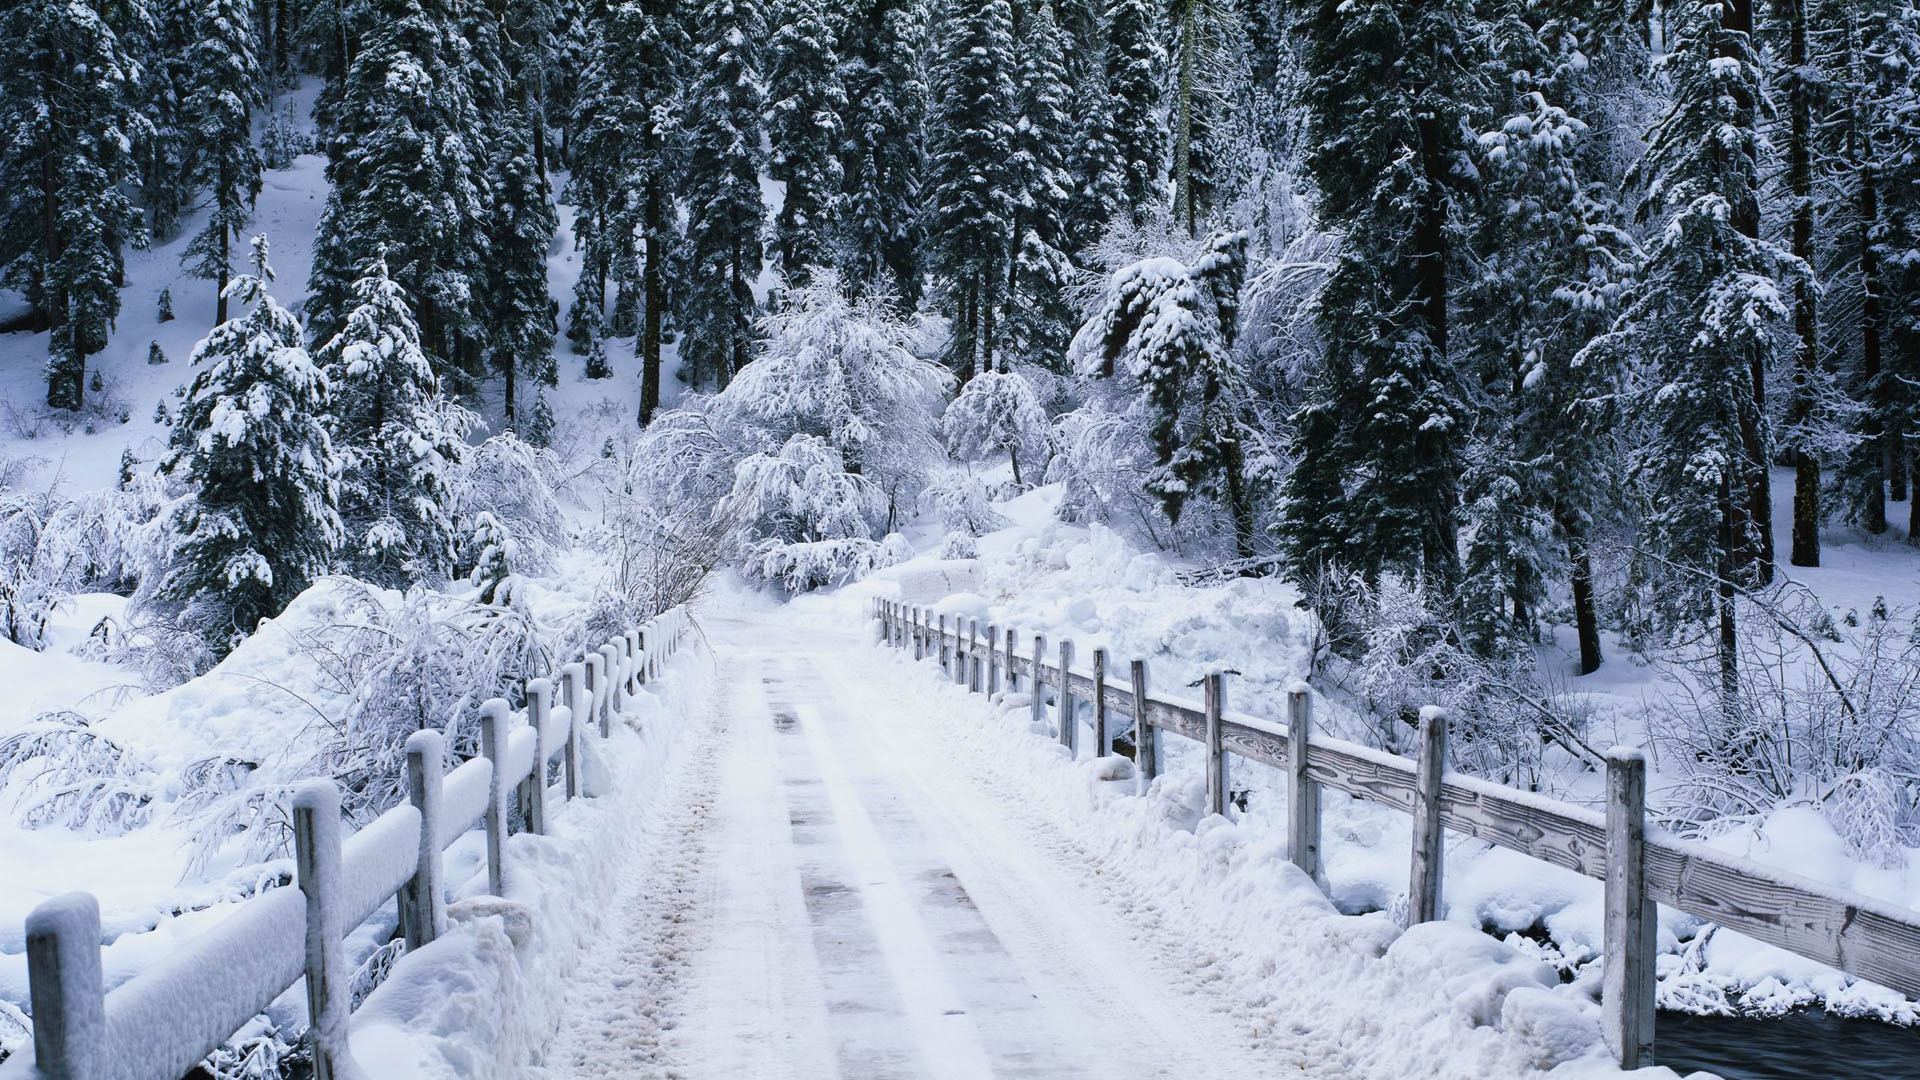 Res: 1920x1080, Snowy Wallpaper HD 46756